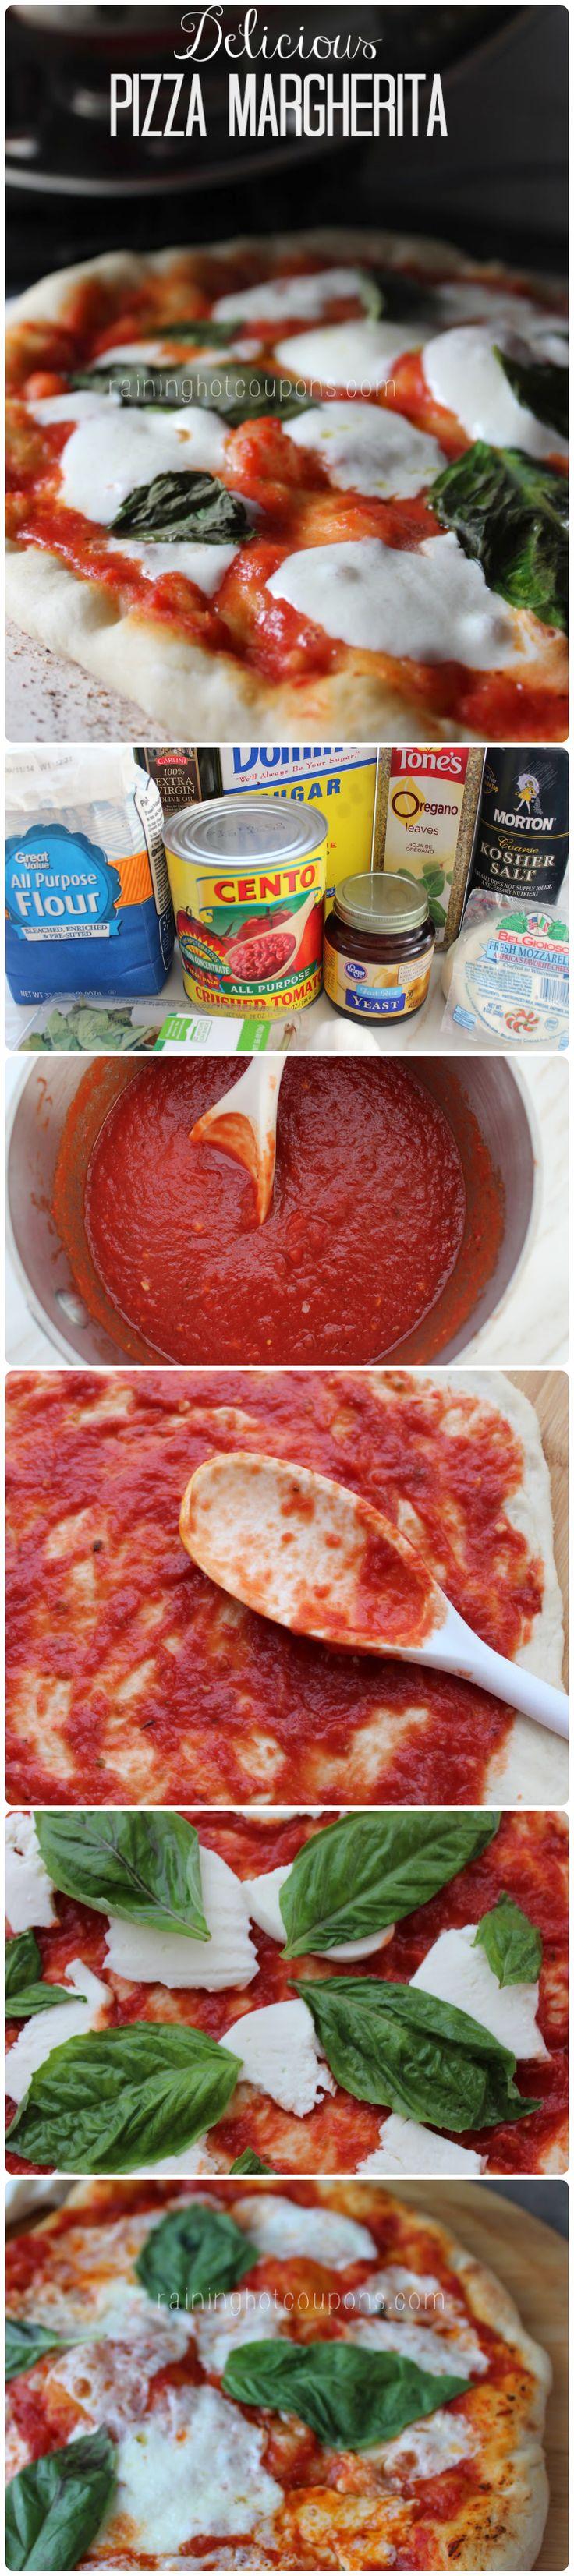 Pizza Margherita Recipe #entree #dinner #italian